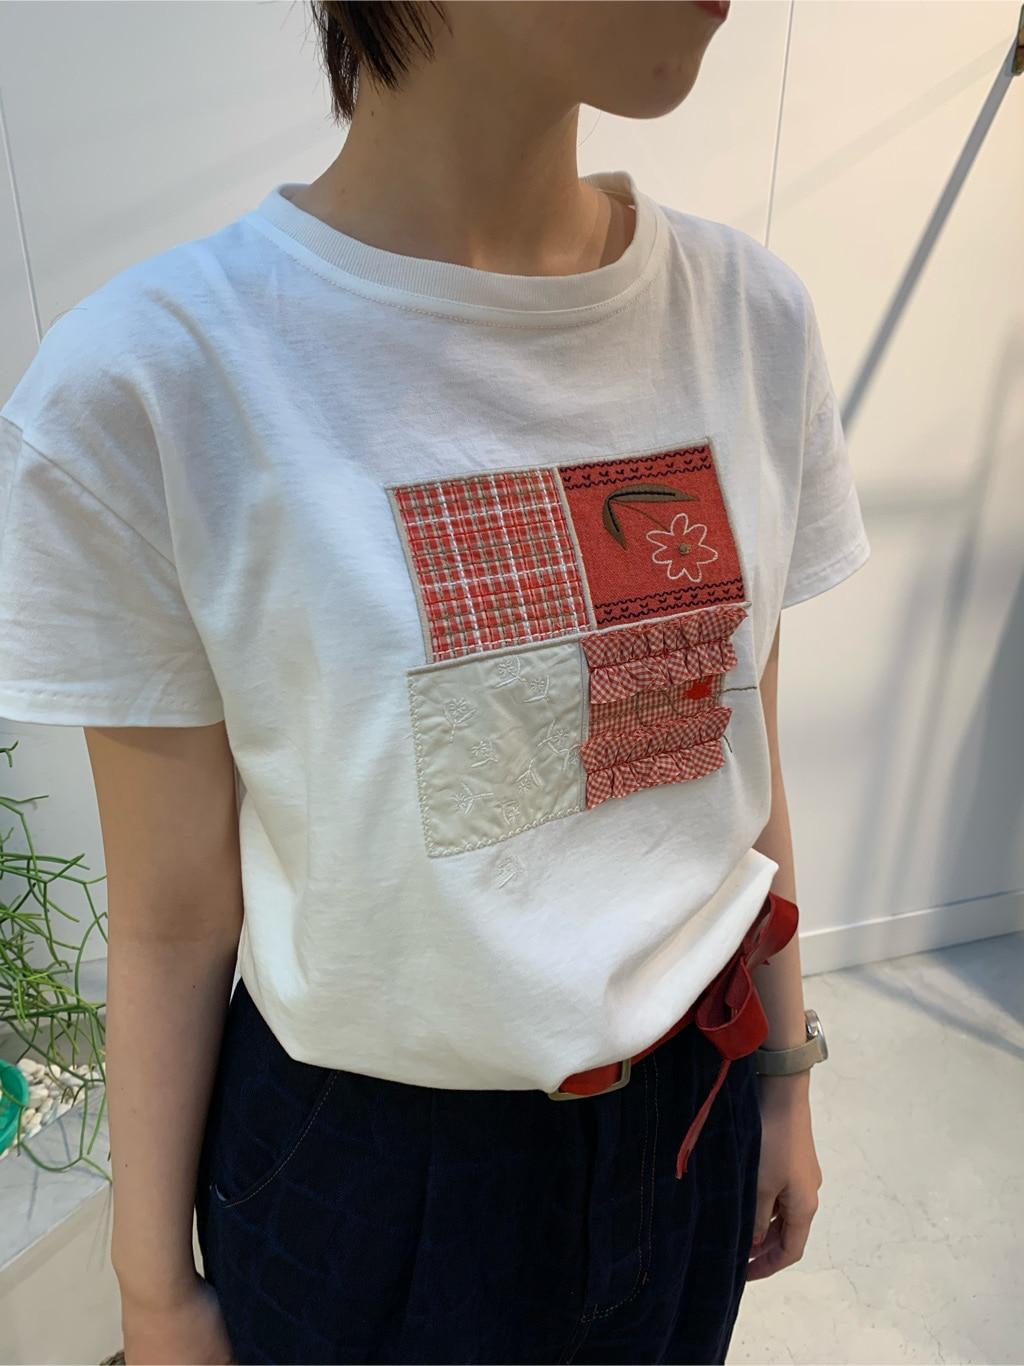 l'atelier du savon 名古屋栄路面 身長:161cm 2020.06.15